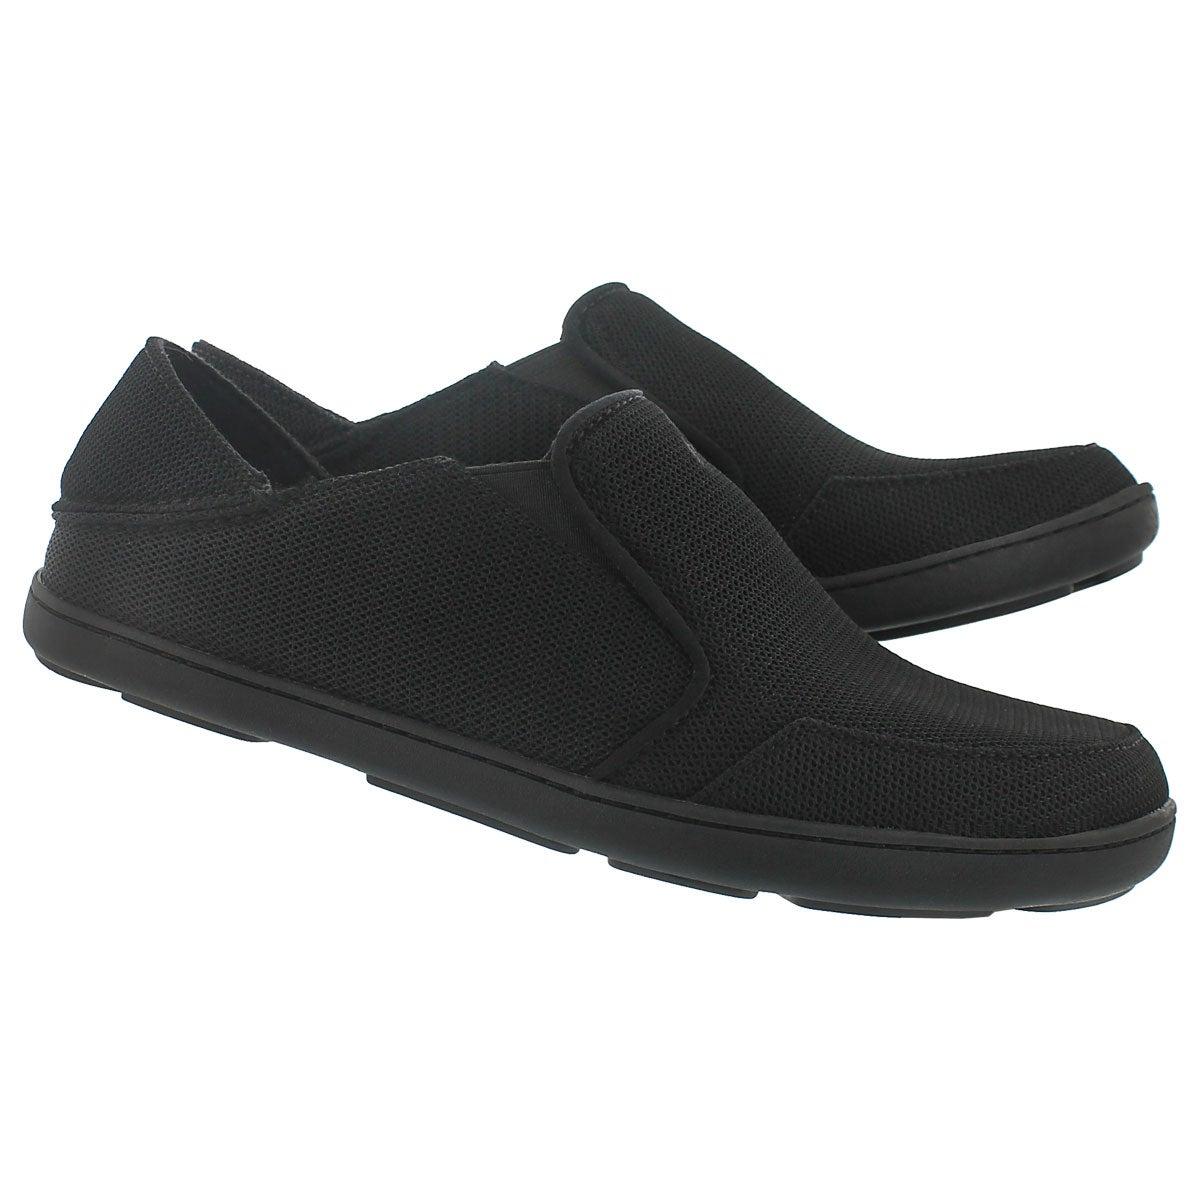 Mns Nohea Mesh onyx slip on casual shoe